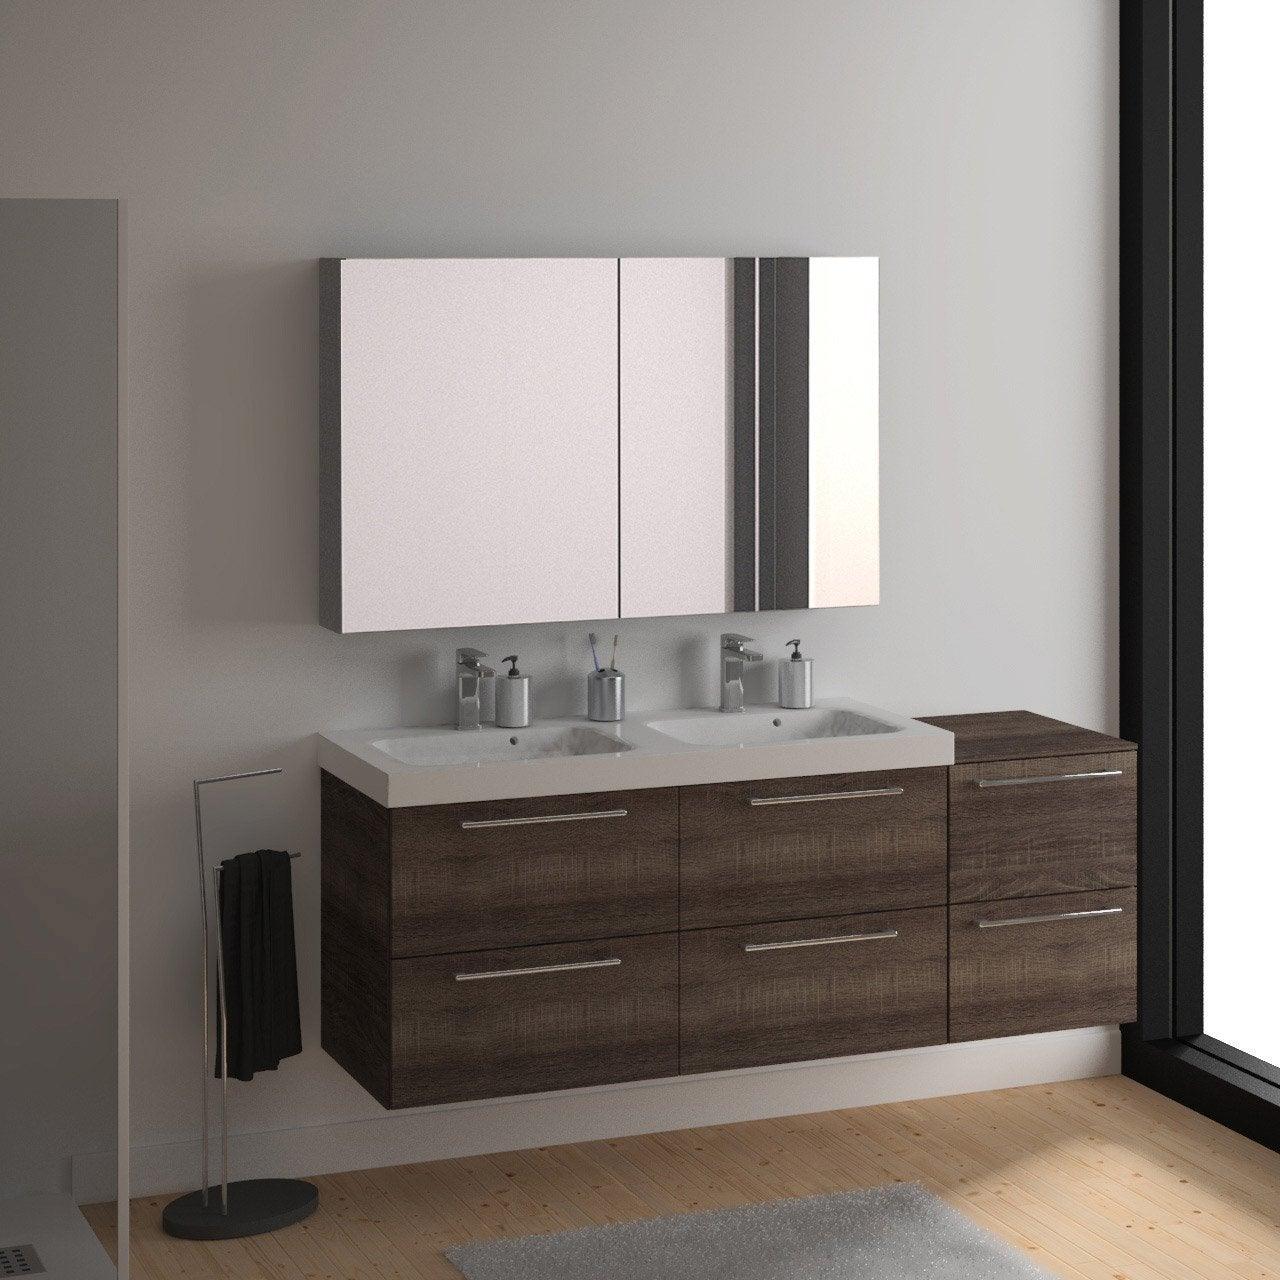 meuble vasque 121 cm d cor ch ne havane remix leroy merlin. Black Bedroom Furniture Sets. Home Design Ideas